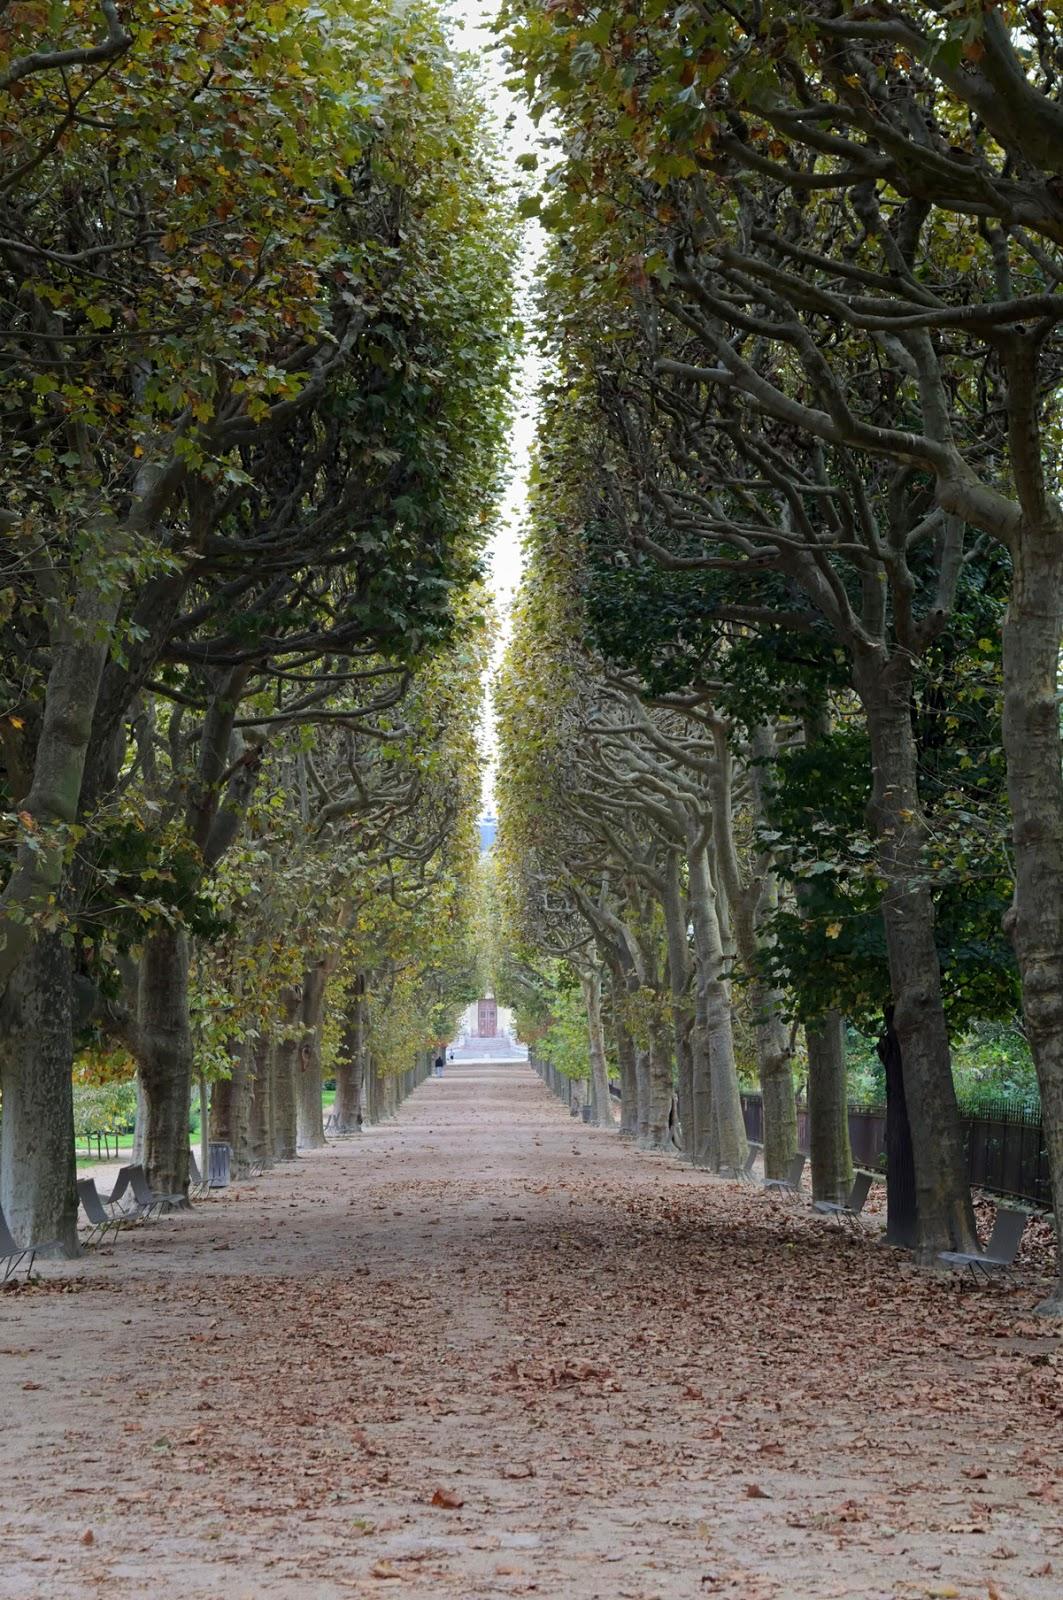 Jardin de plantes Paris.